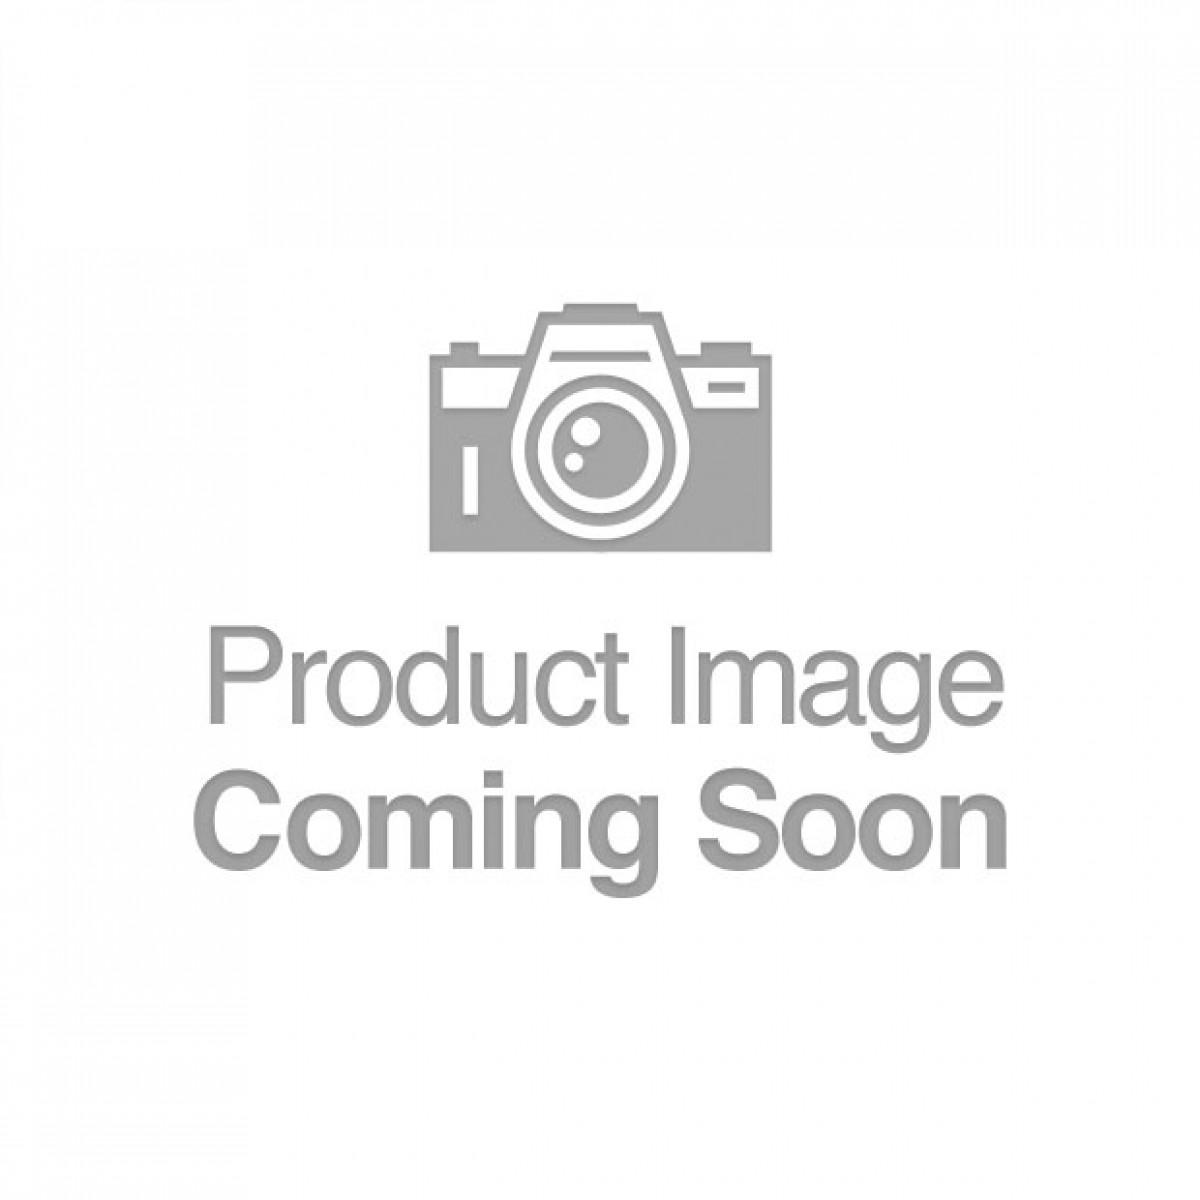 PDX Plus Pick Your Pleasure Stroker - Tan